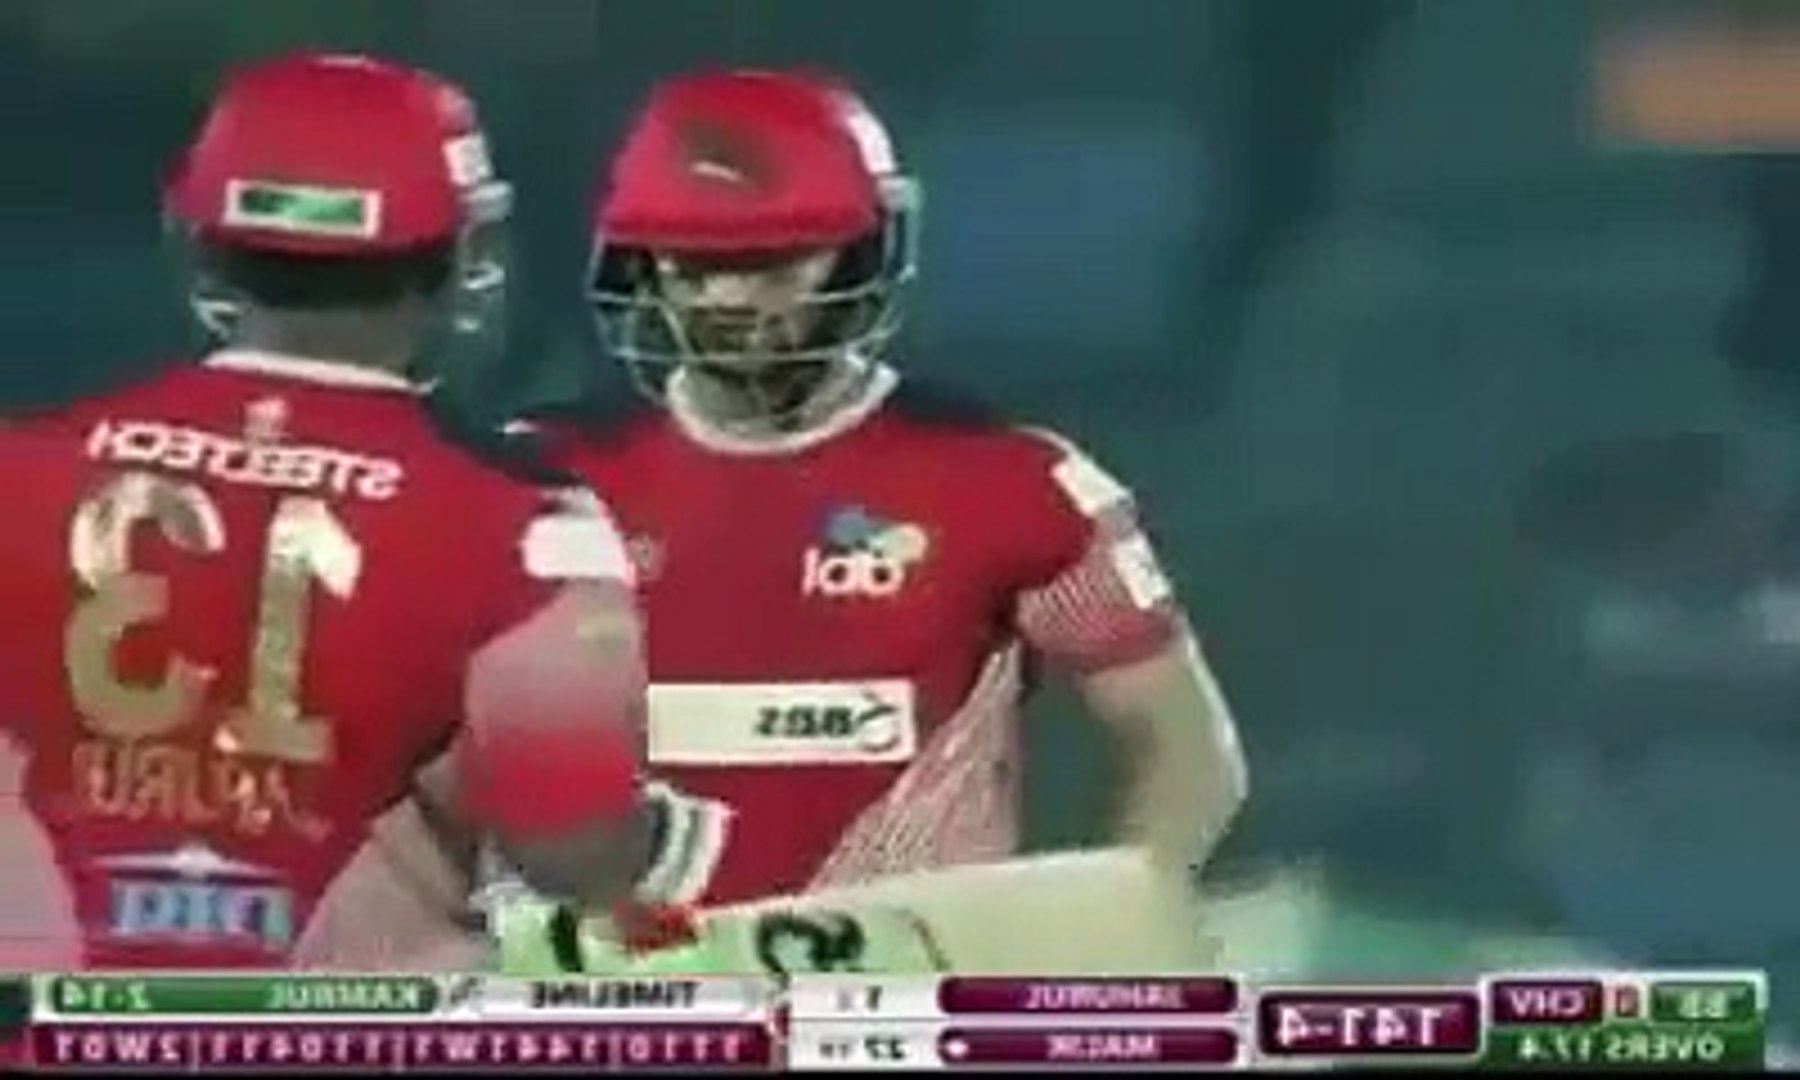 BPL 2016 Match 24 Chittagong vs Barisal-Shoaib Malik 63 Runs on 30 Balls